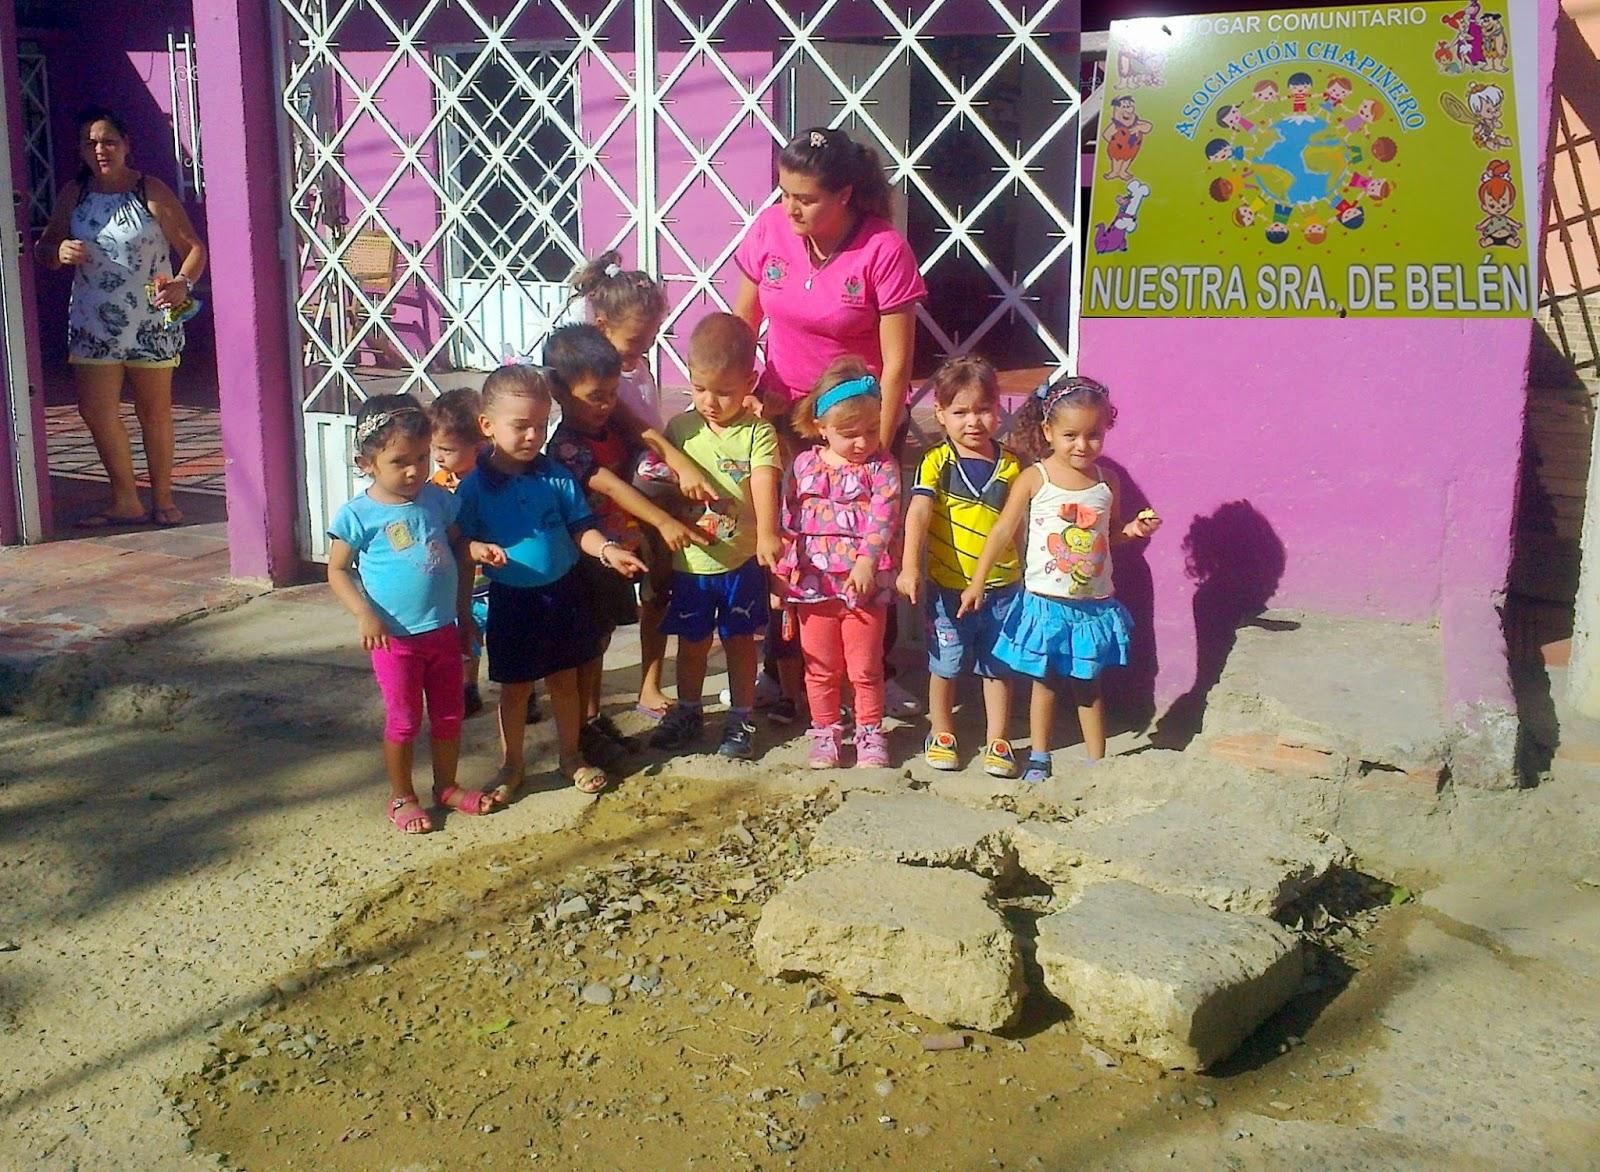 #AguasKpital Cúcuta repara bote de agua pero deja la calle sin pavimento #ExclusivaMovilNOTICIAS #OngAE